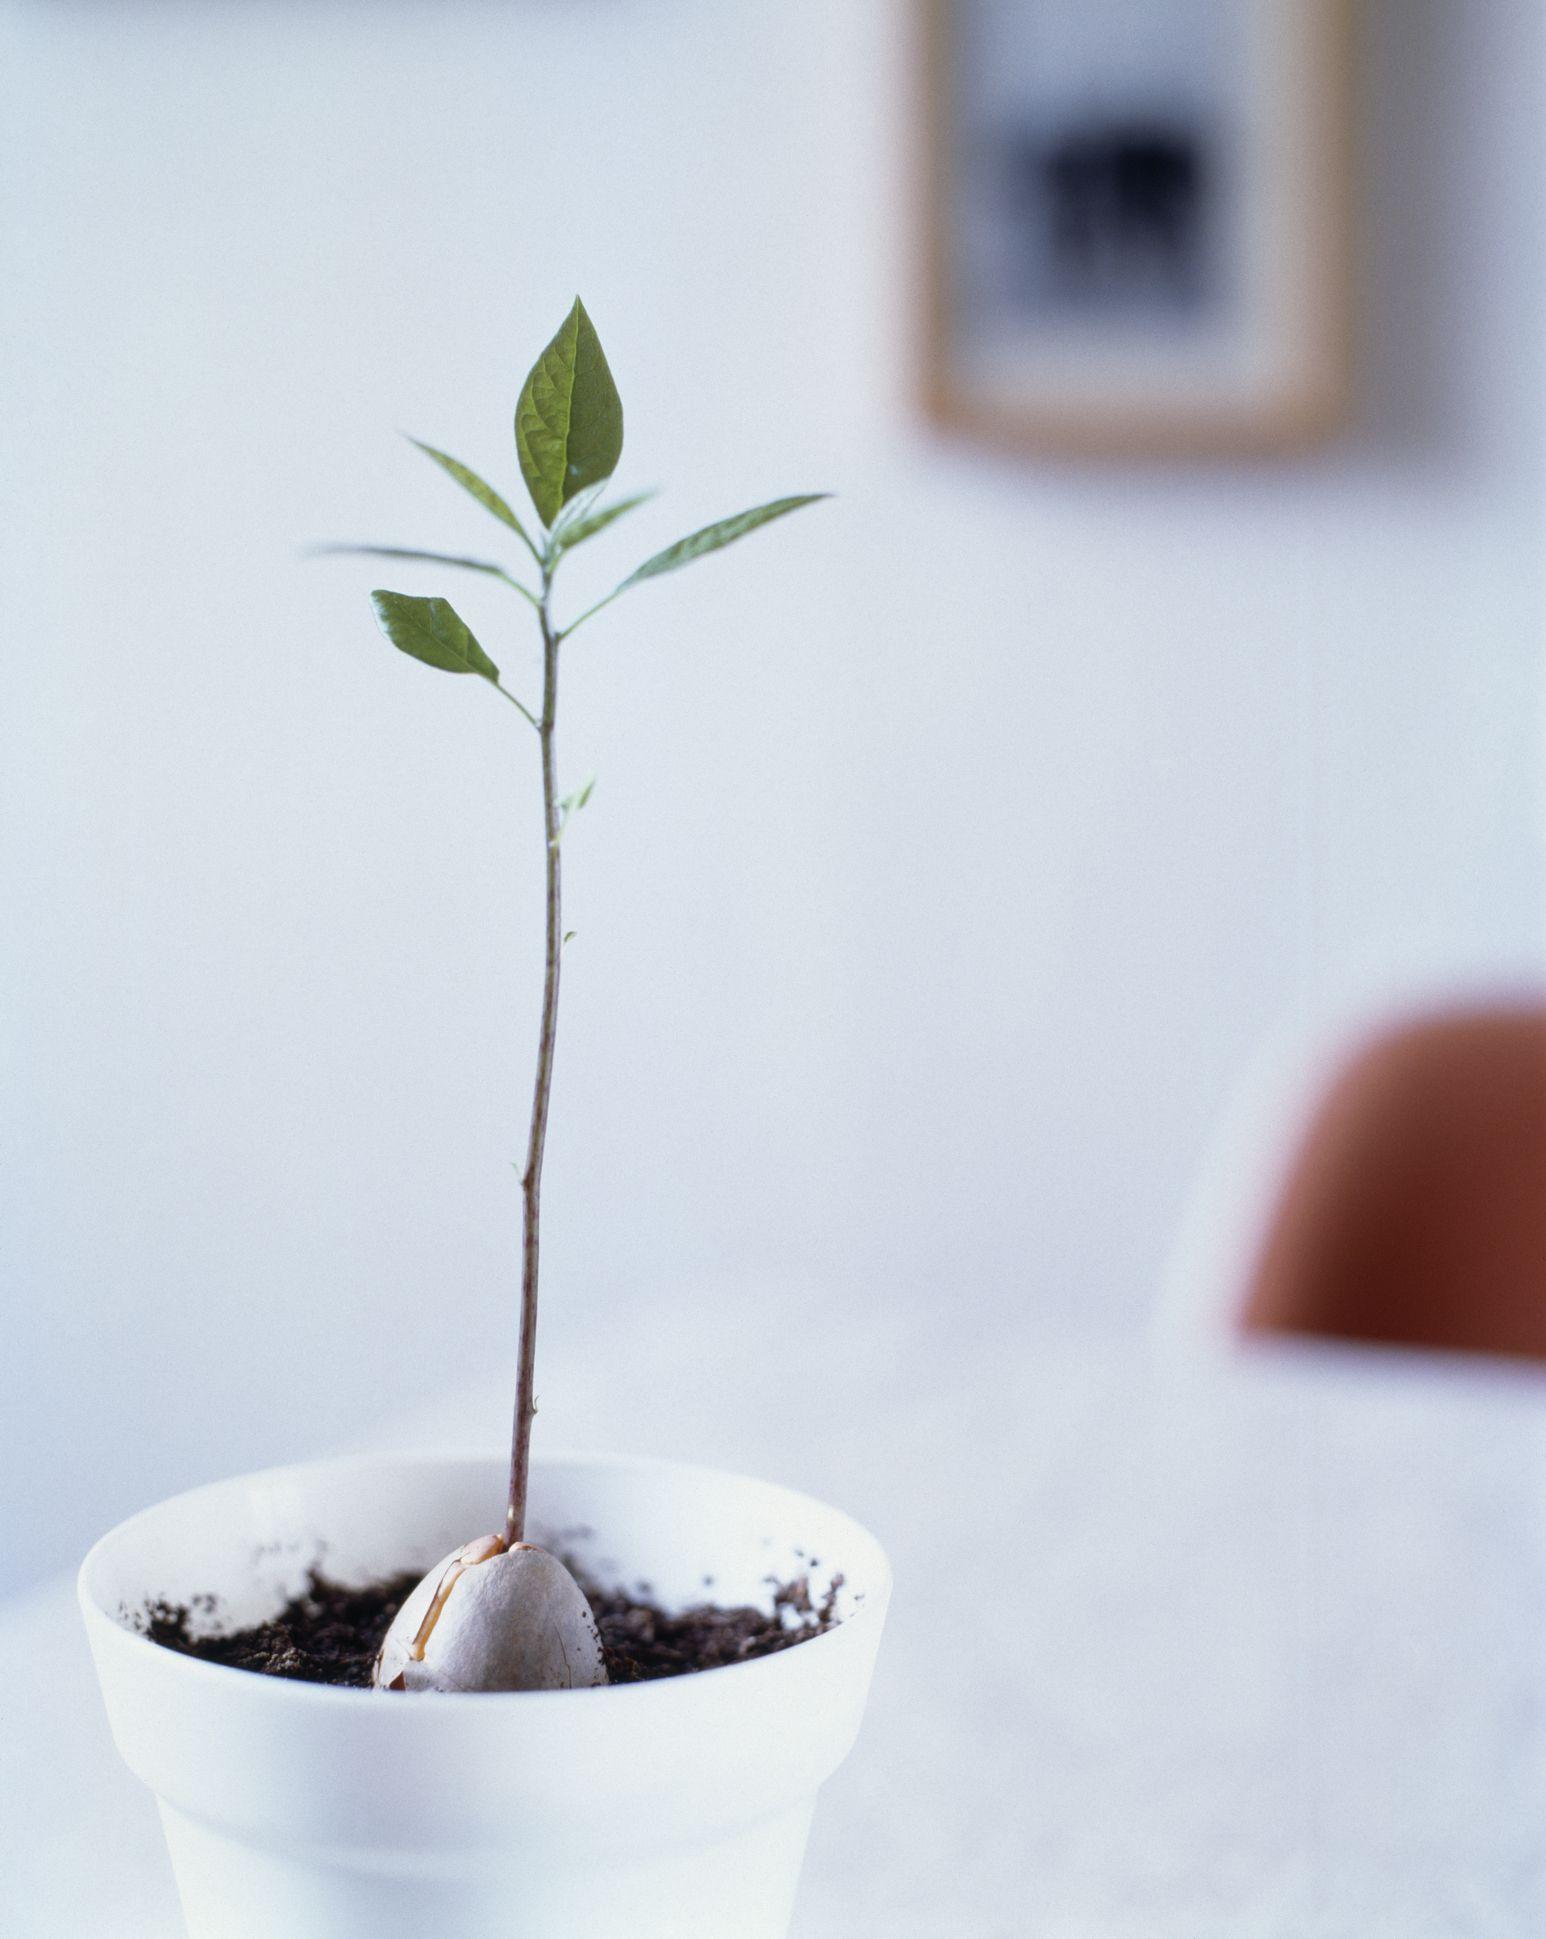 Growing Avocados As Houseplants